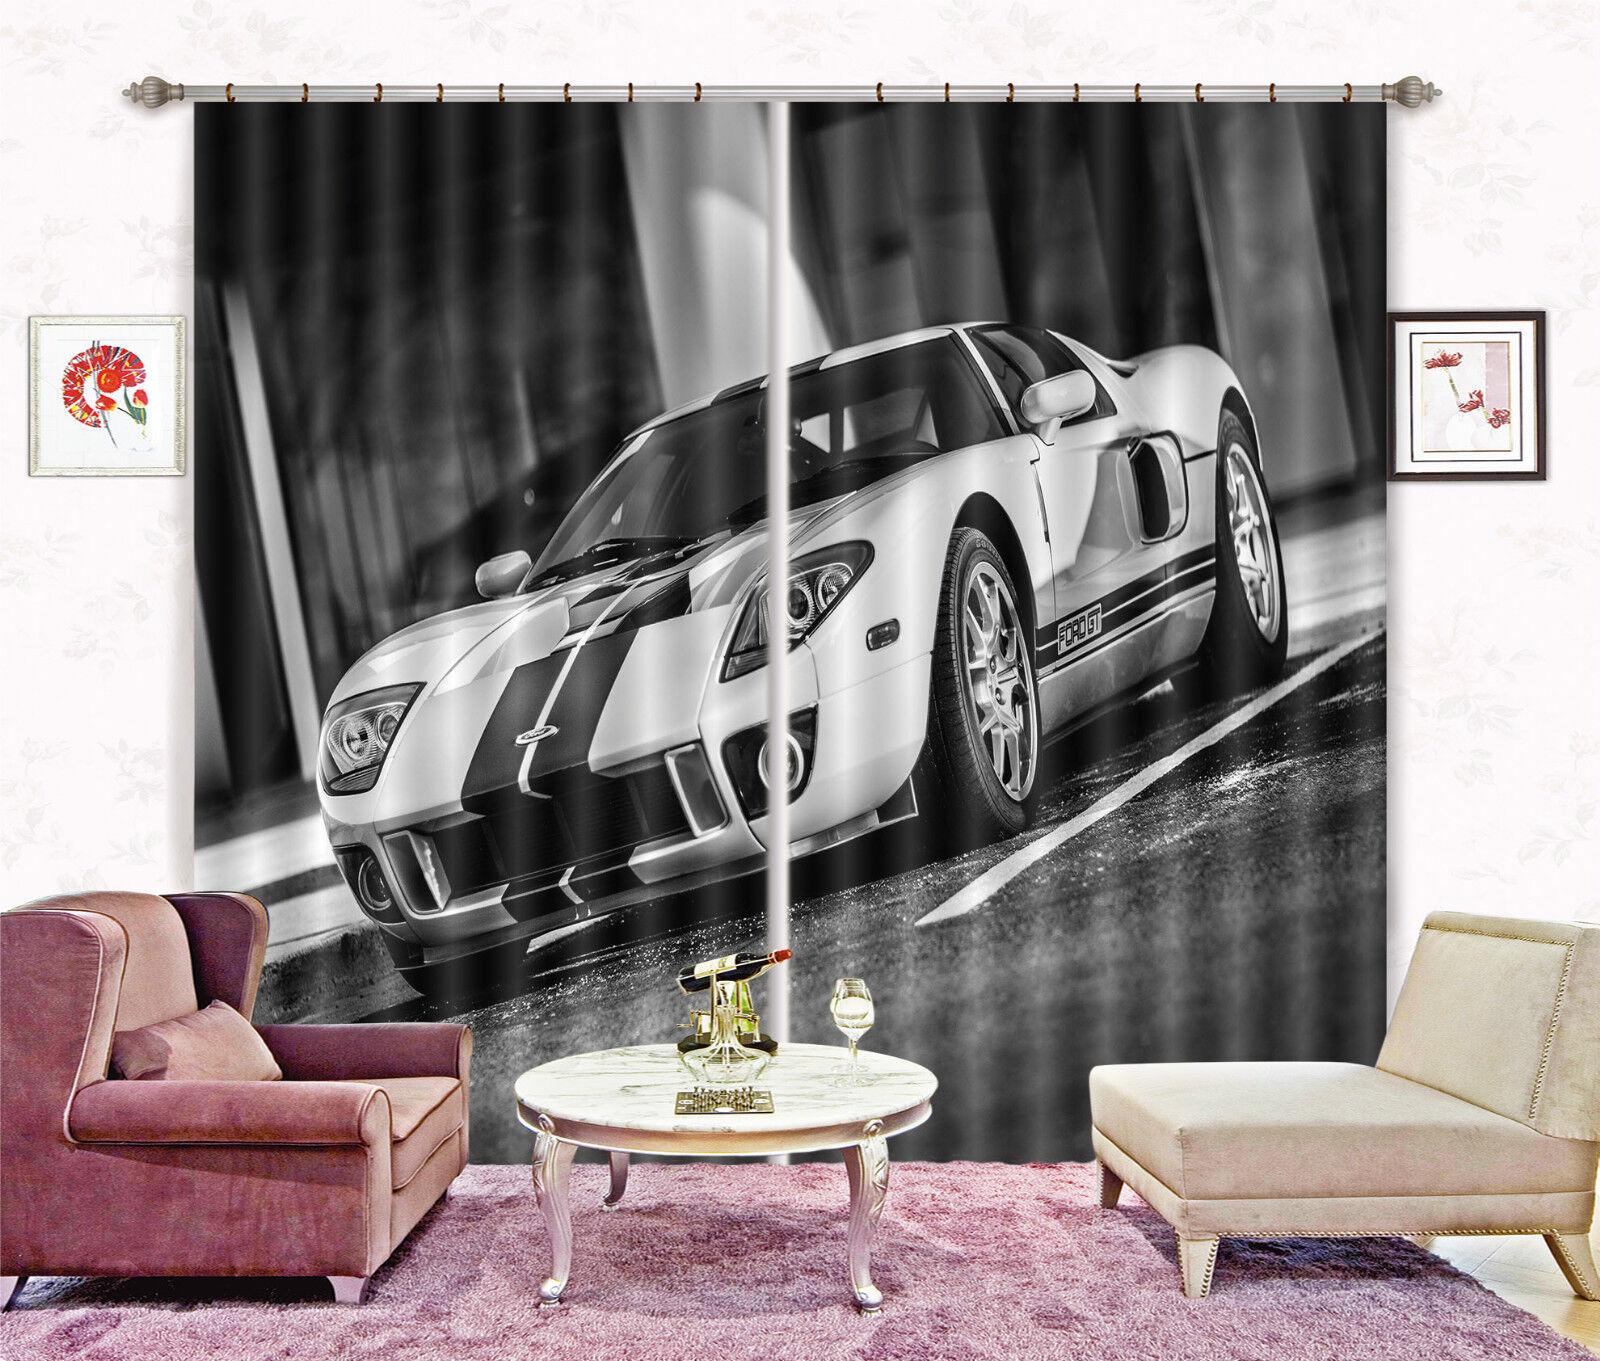 3d blancoo auto 3265 bloqueo foto cortina cortina de impresión sustancia cortinas de ventana